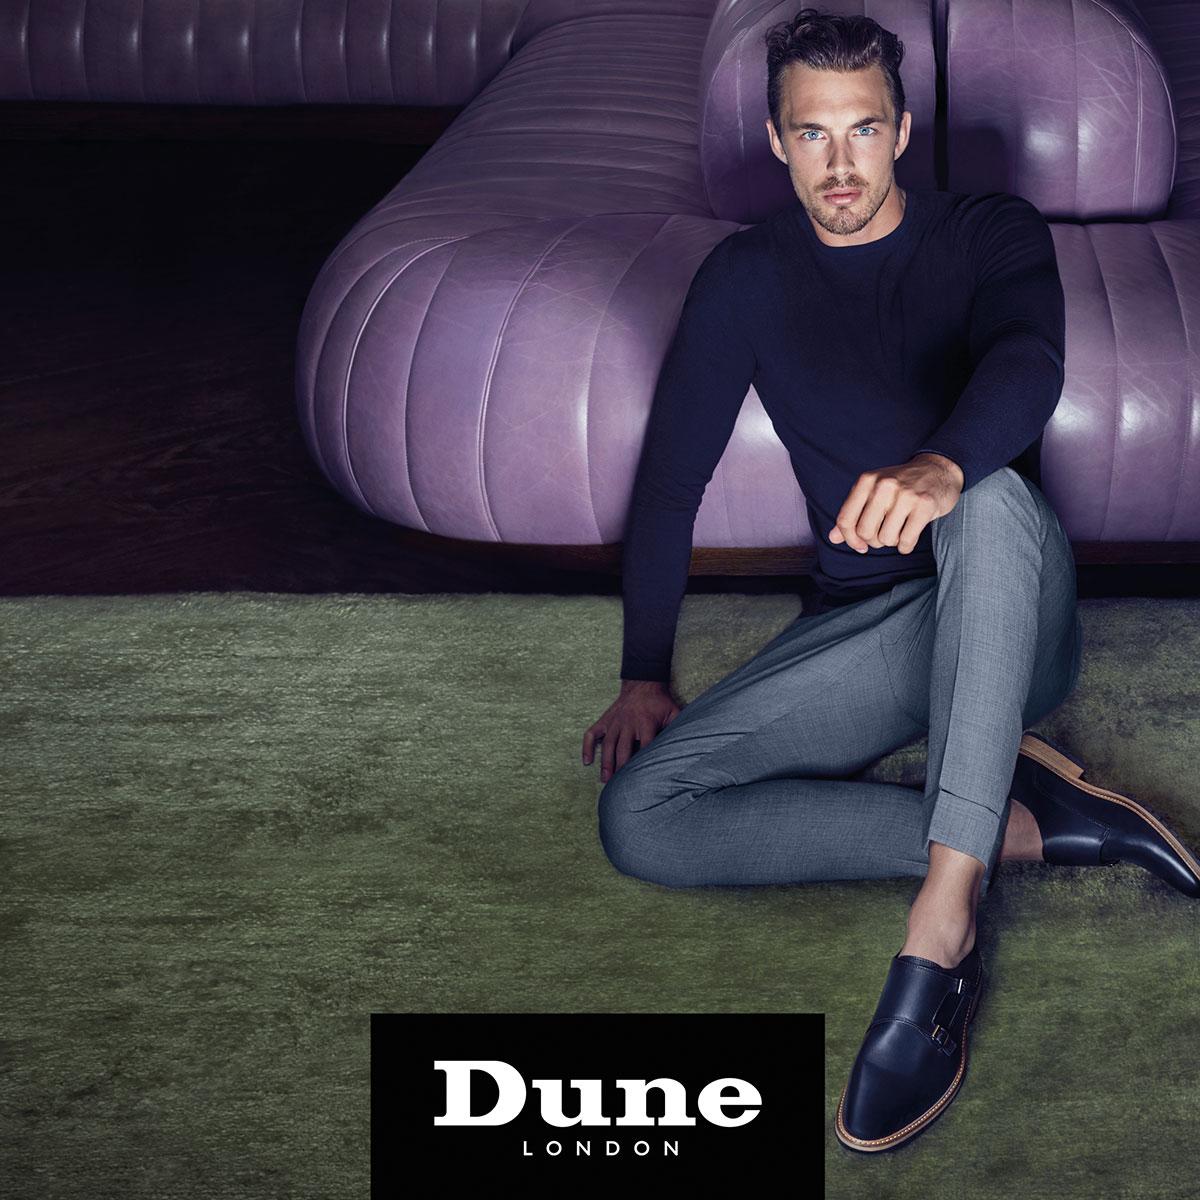 Dune-003.jpg